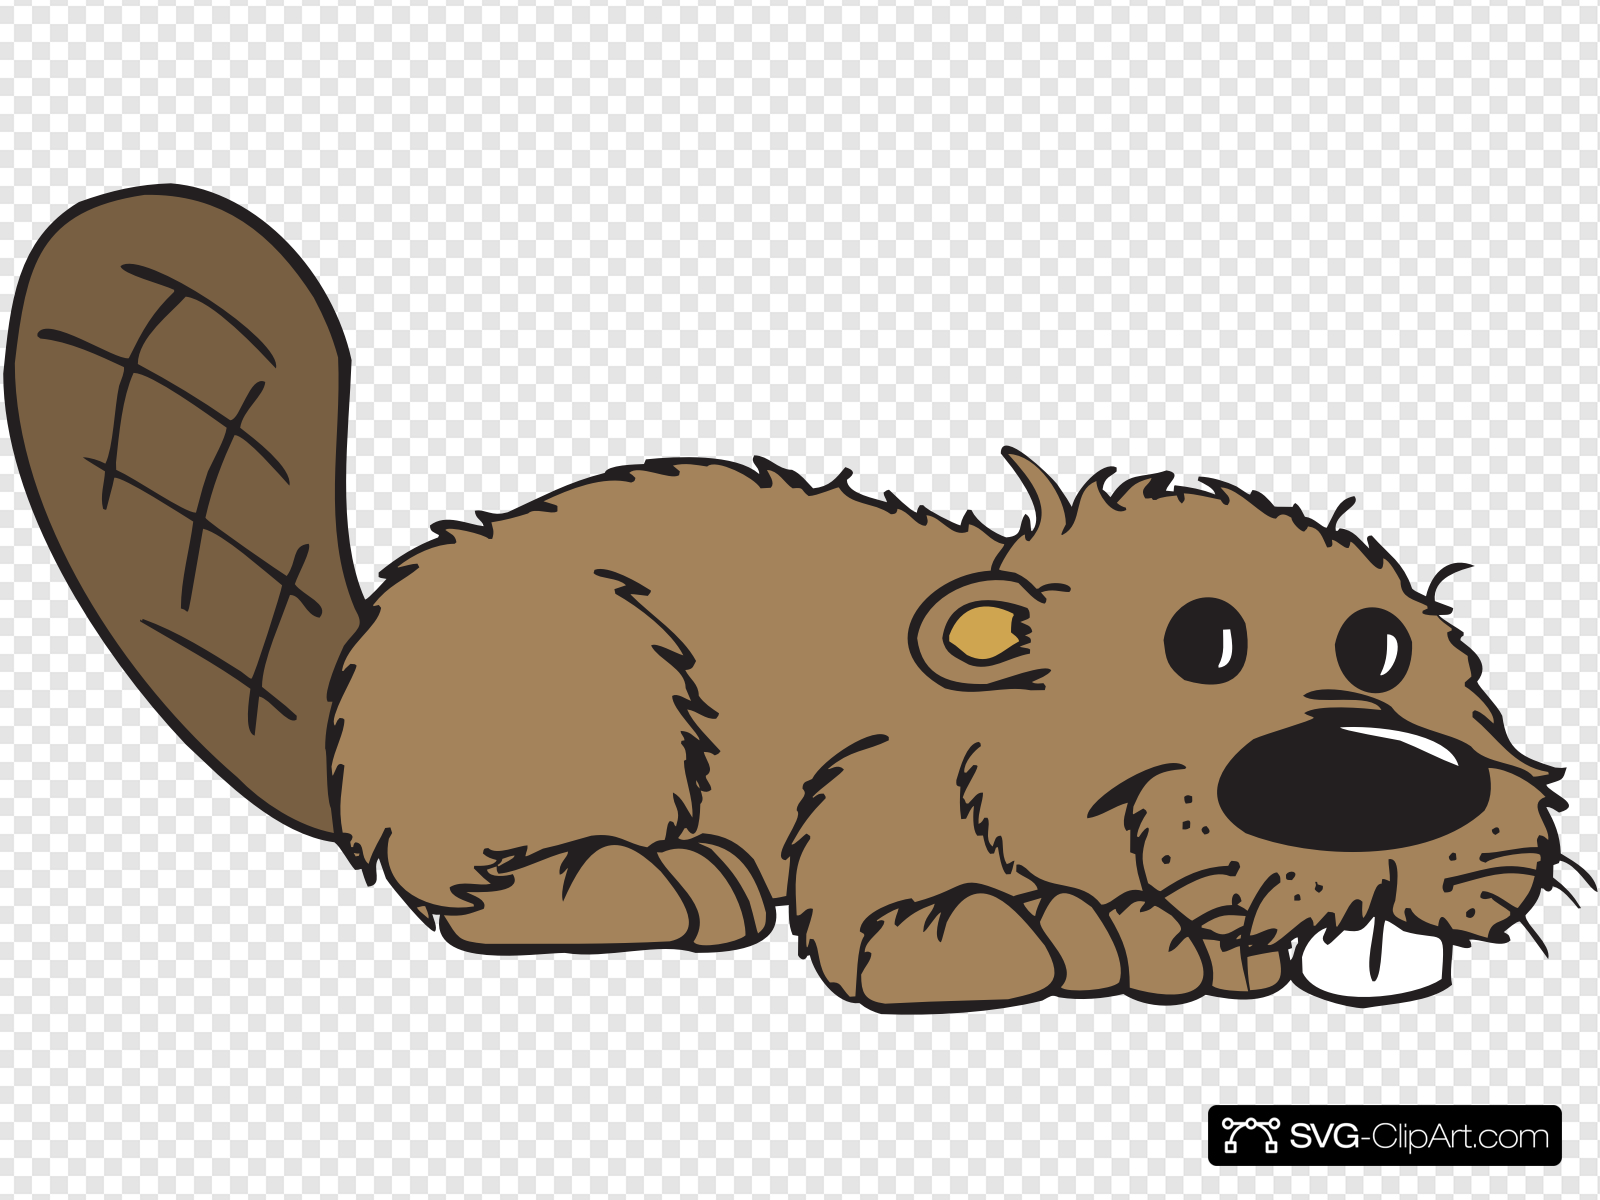 Cartoon Beaver Clip art, Icon and SVG.